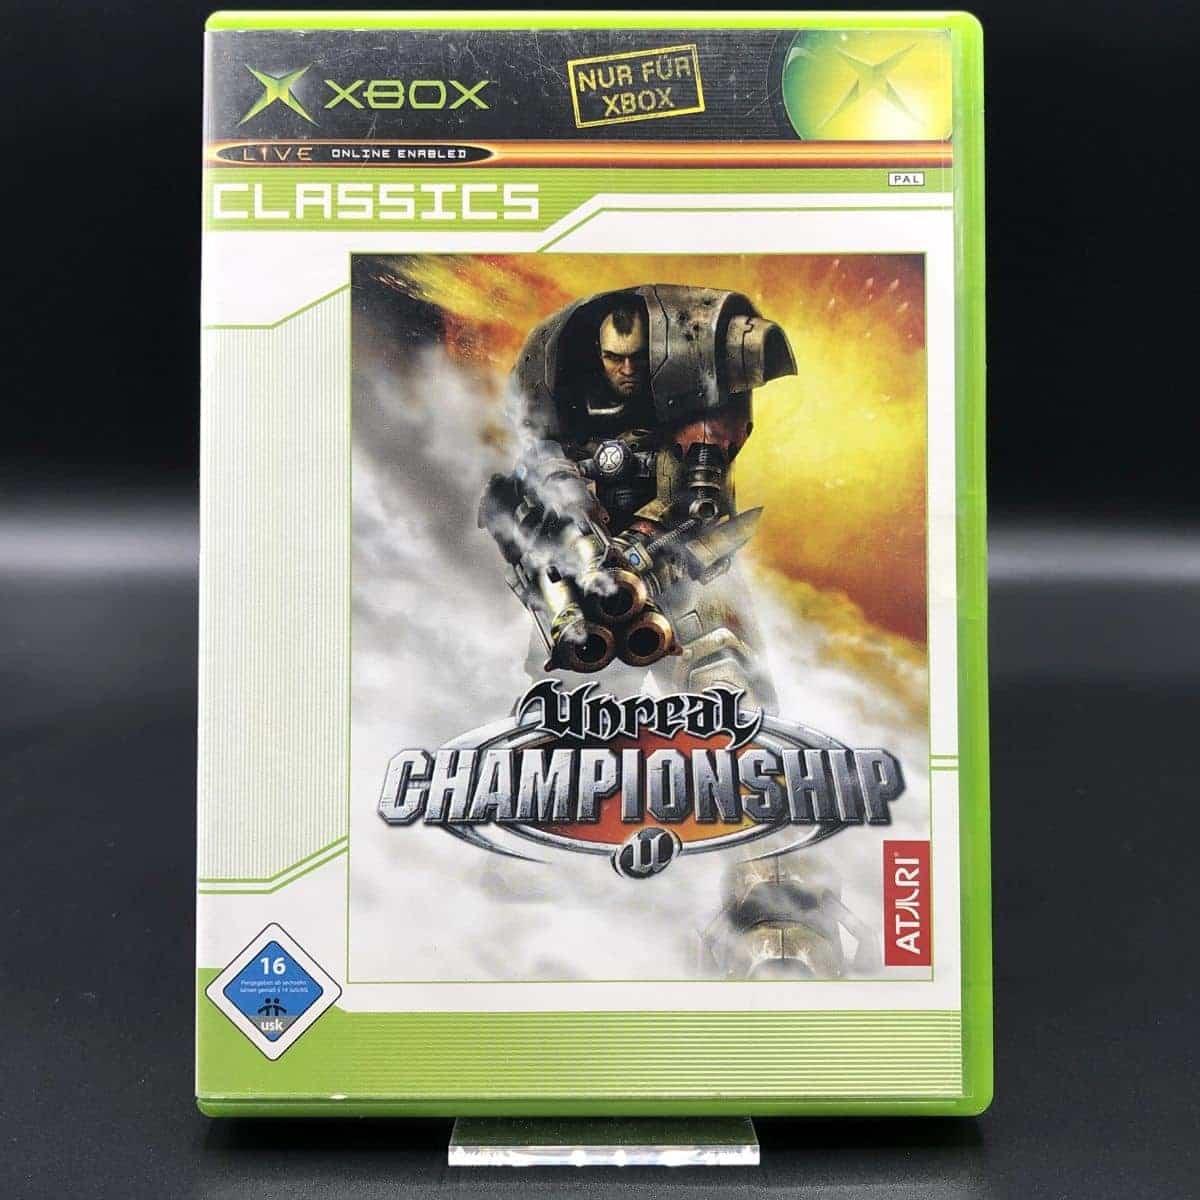 XBC Unreal Championship (Classics) (Komplett) (Gut) Microsoft Xbox Classic